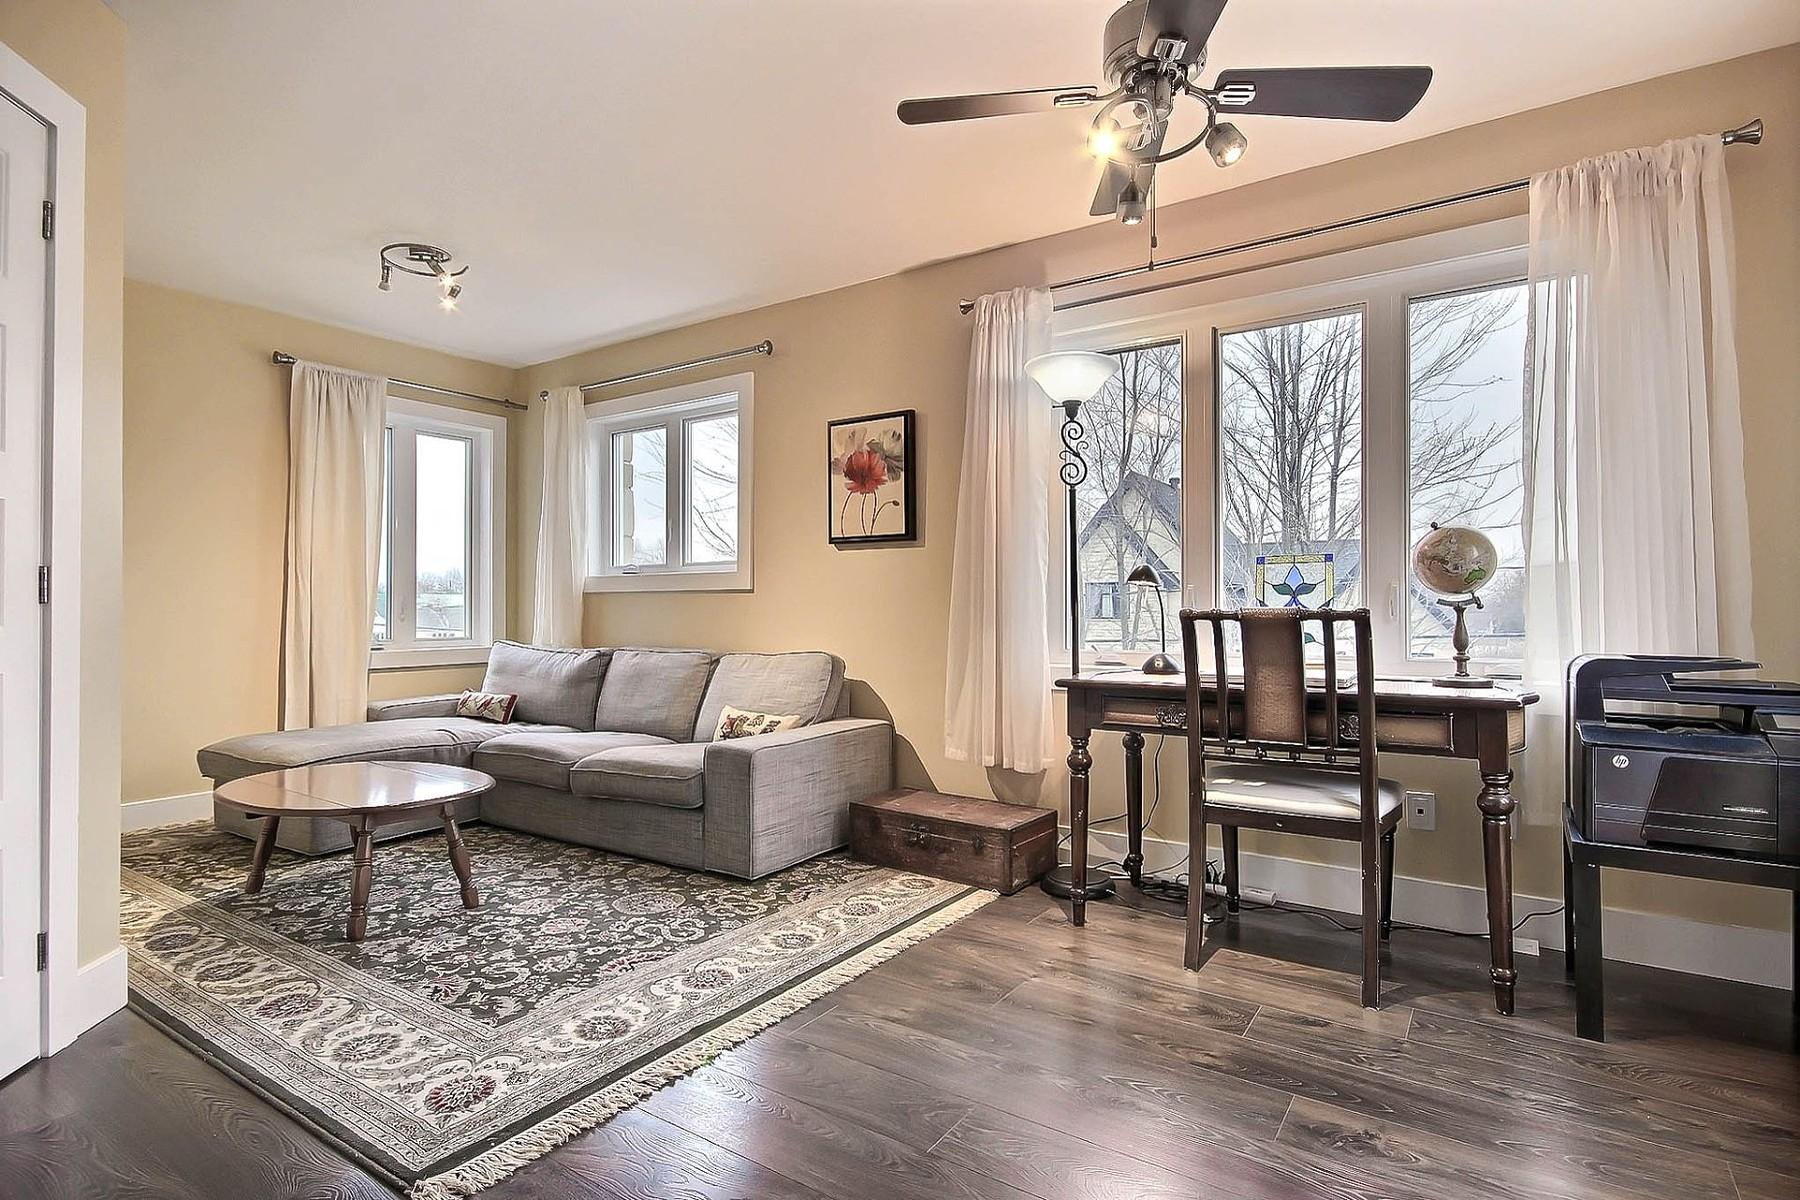 Additional photo for property listing at Carignan, Montérégie 2338 Rue Gertrude Carignan, Quebec J3L4H1 Canada